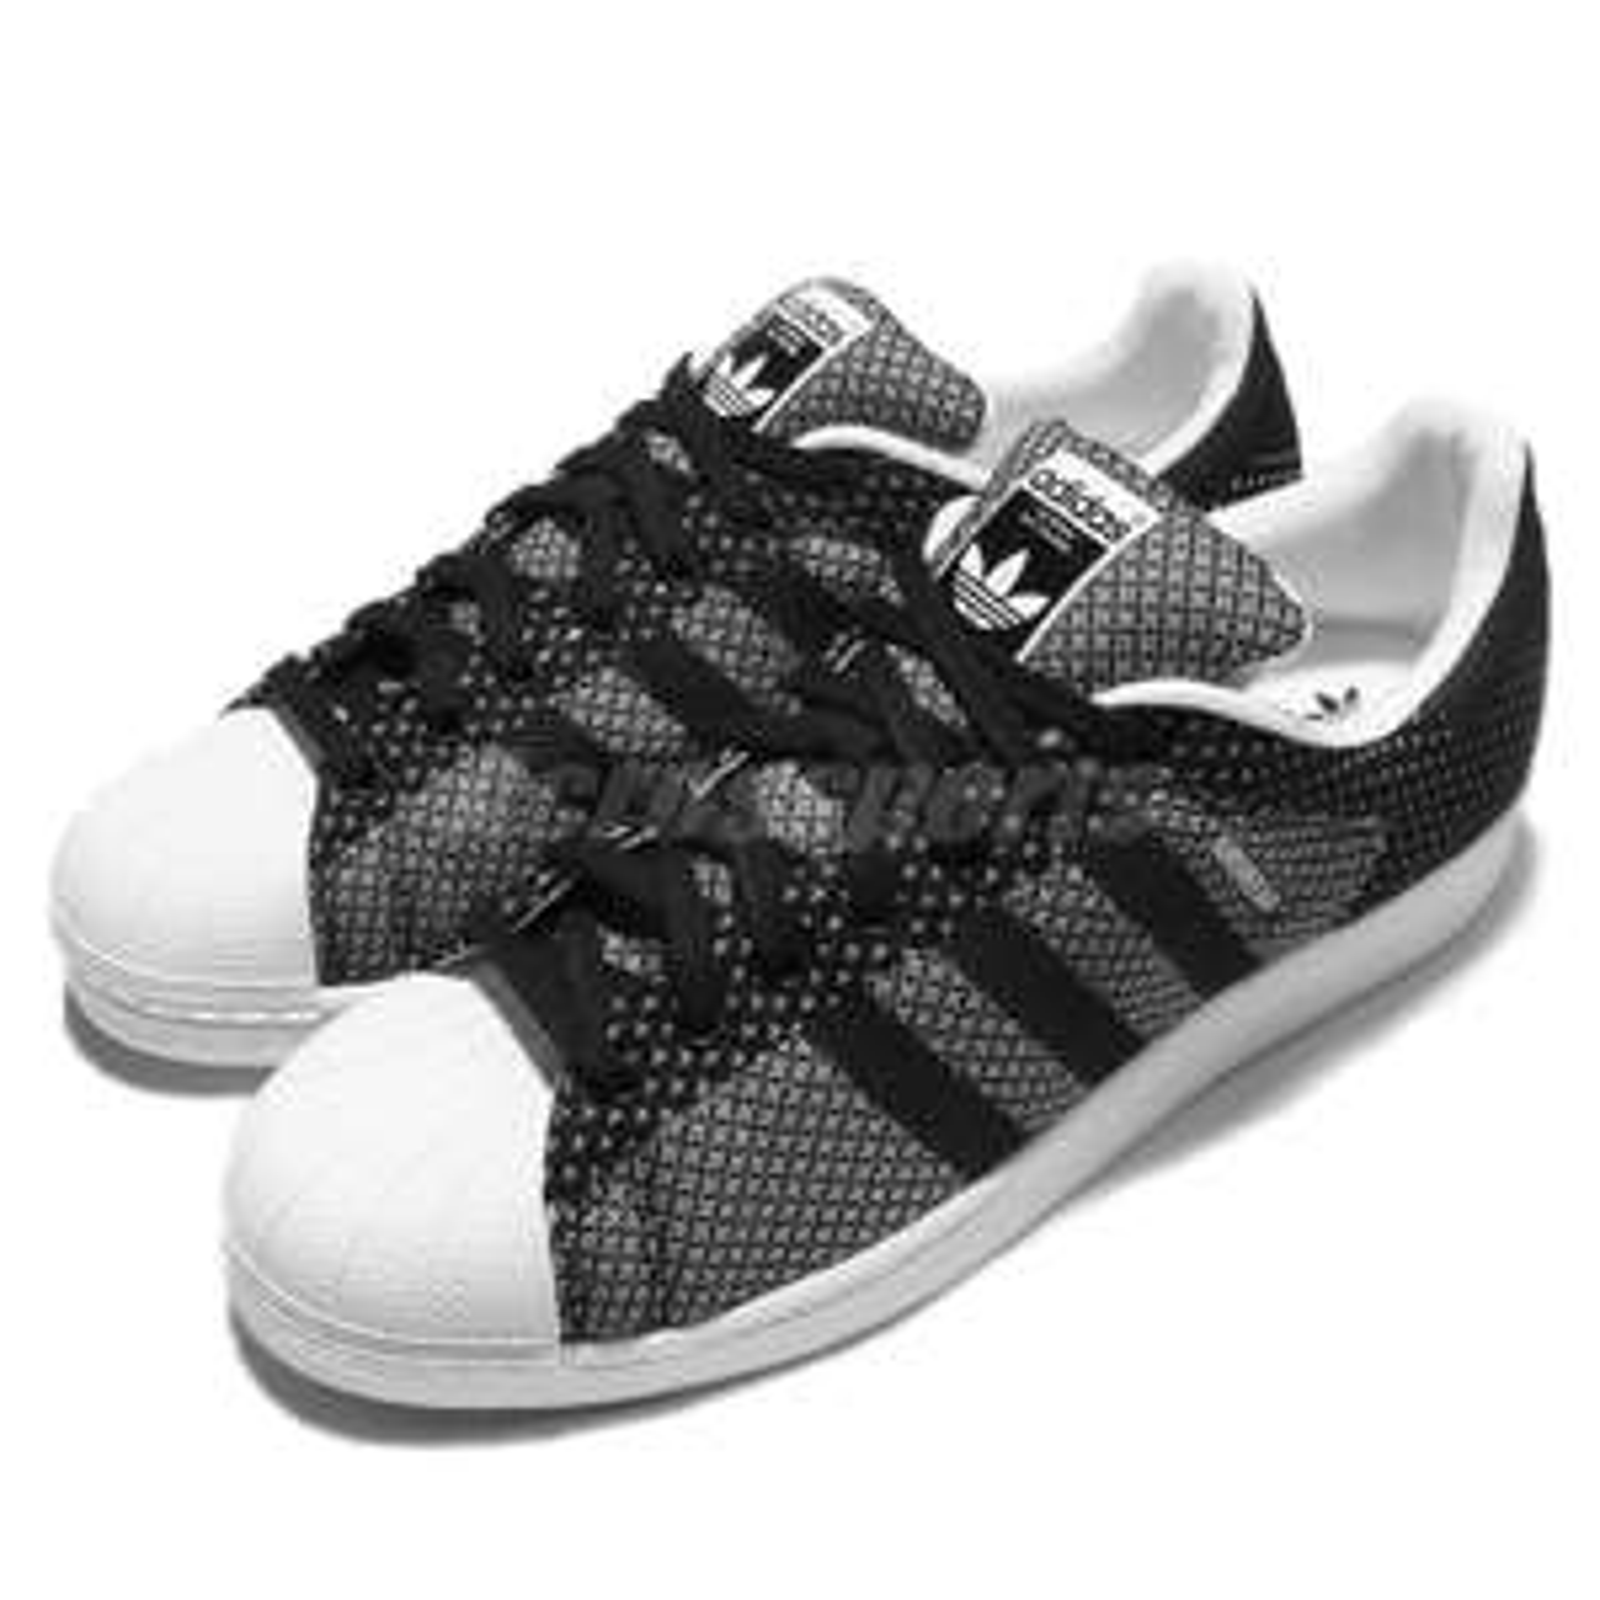 Chaussures Adidas Superstar Weave pour Homme - Noir/Blanc (Plusieurs tailles)